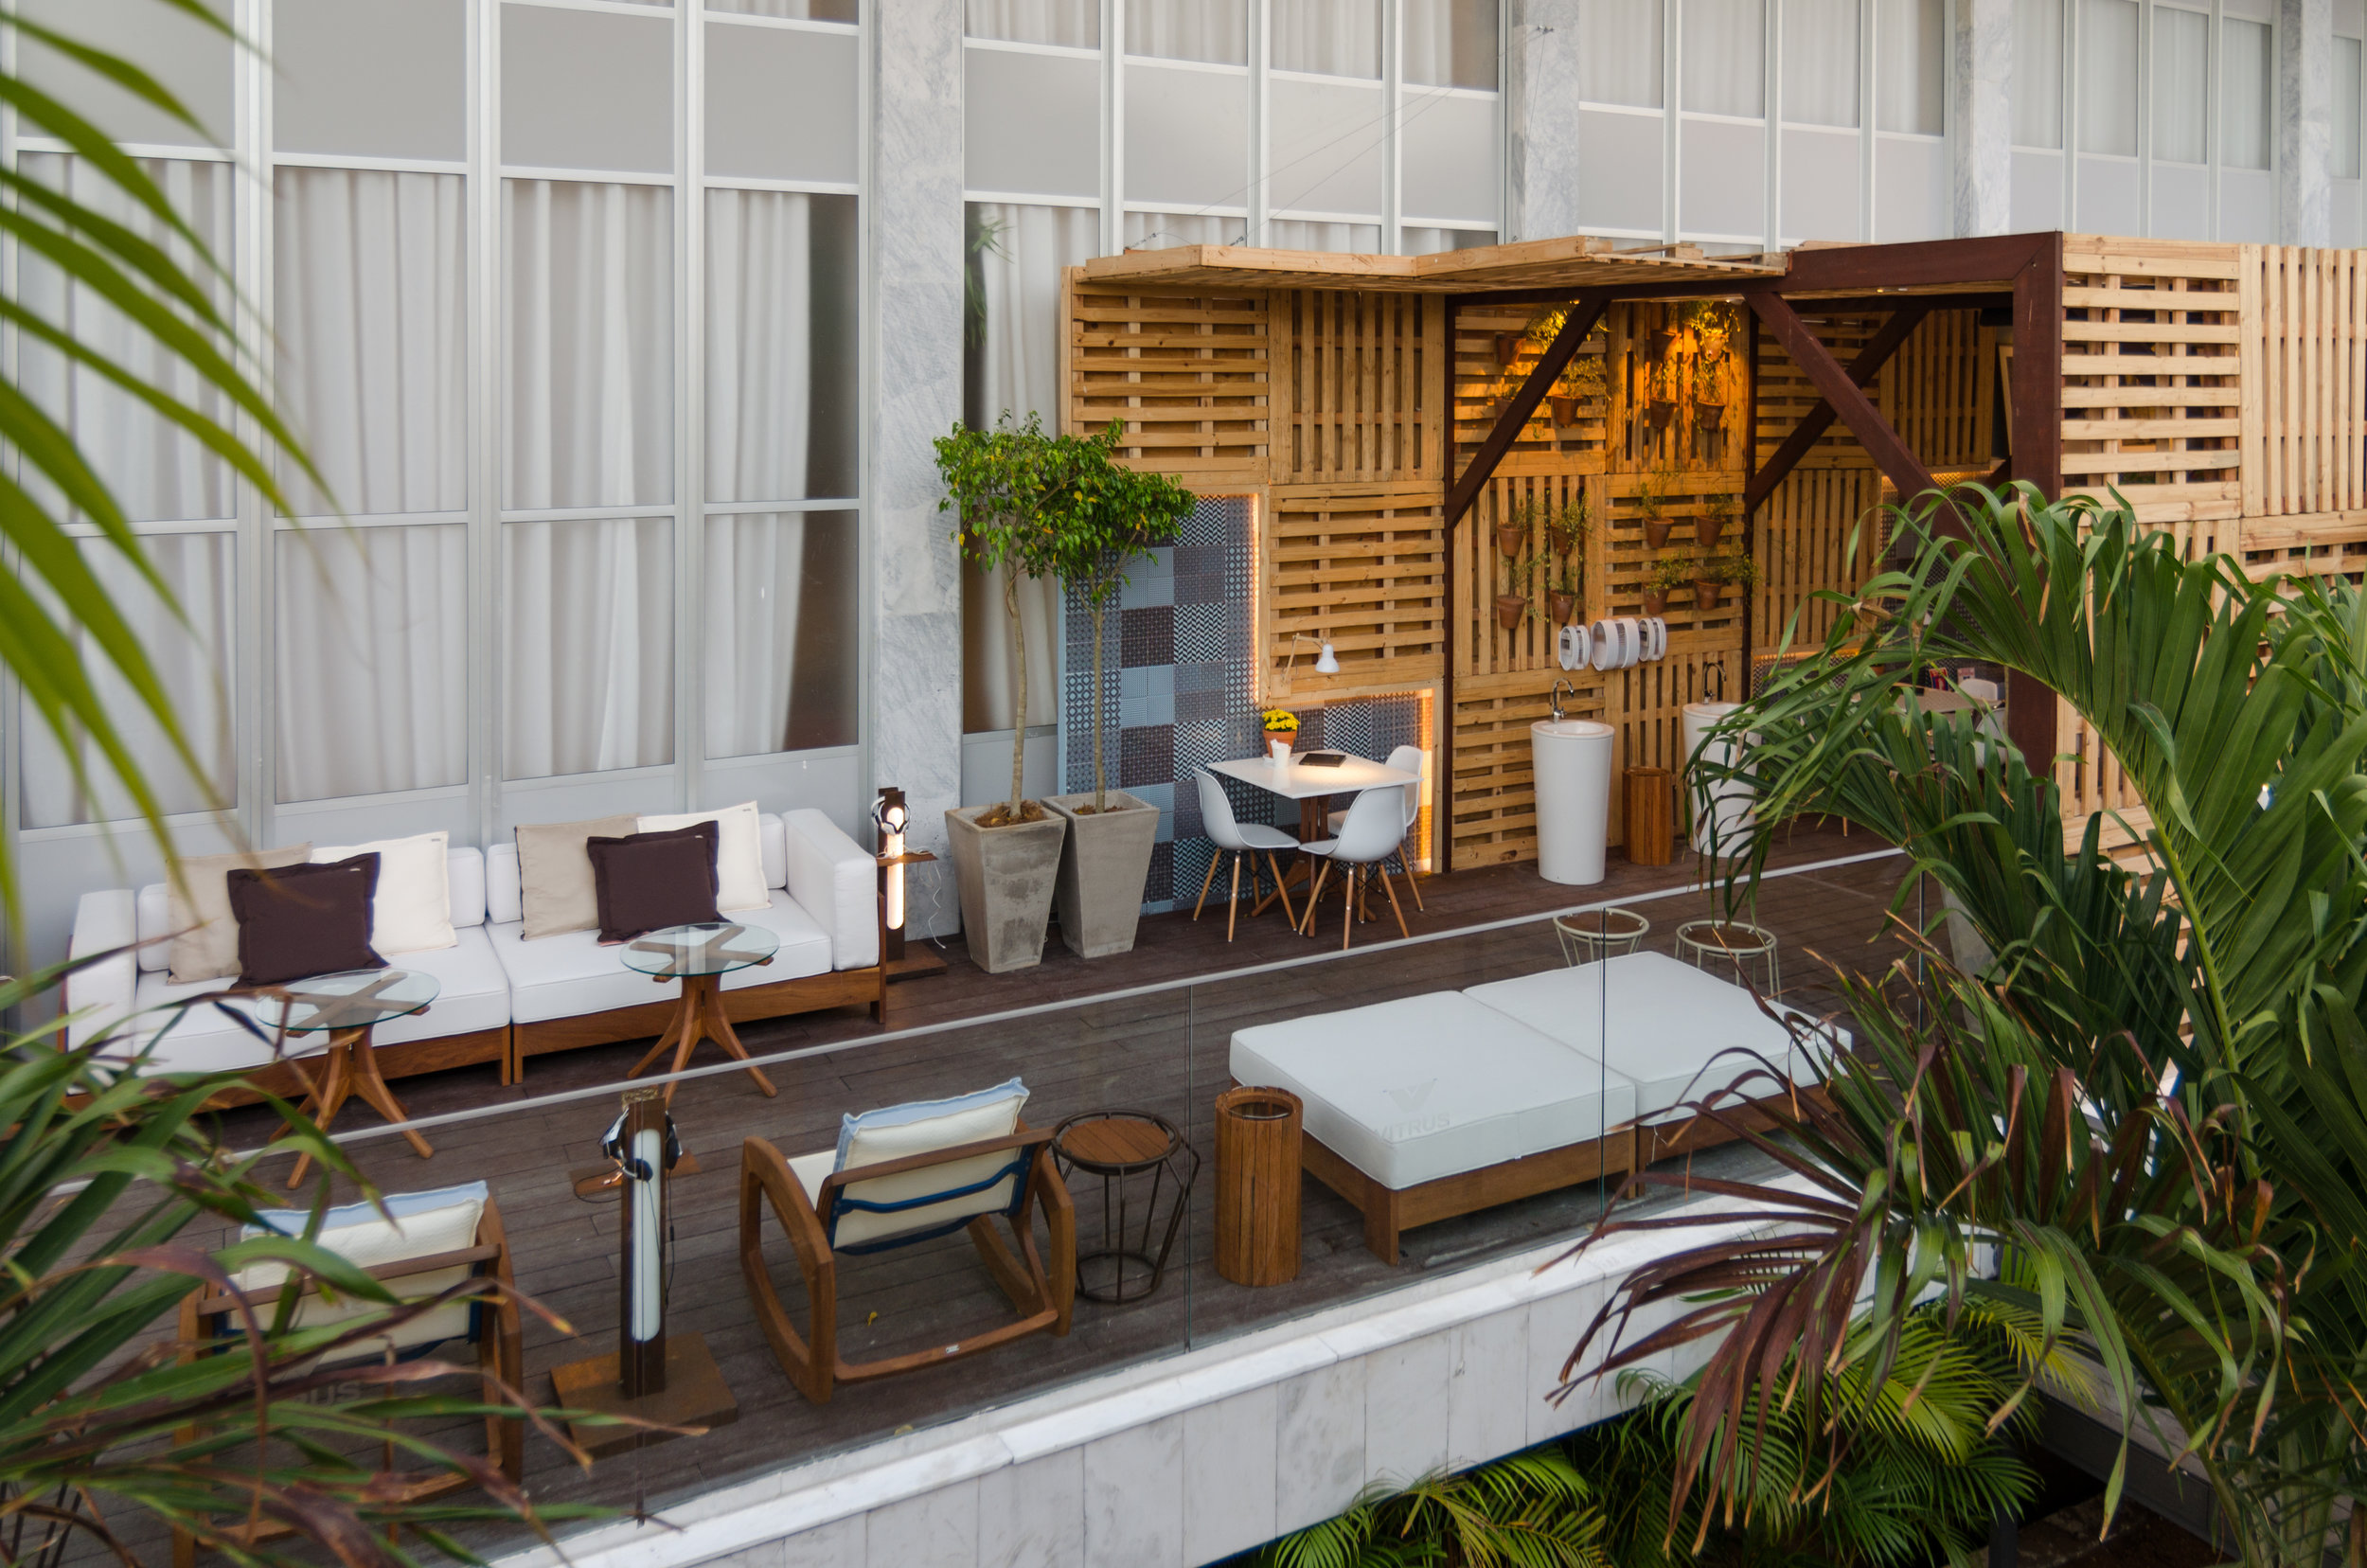 projeto-arquitetonico-cuoredipannacc-duo-arquitetura-010.jpg